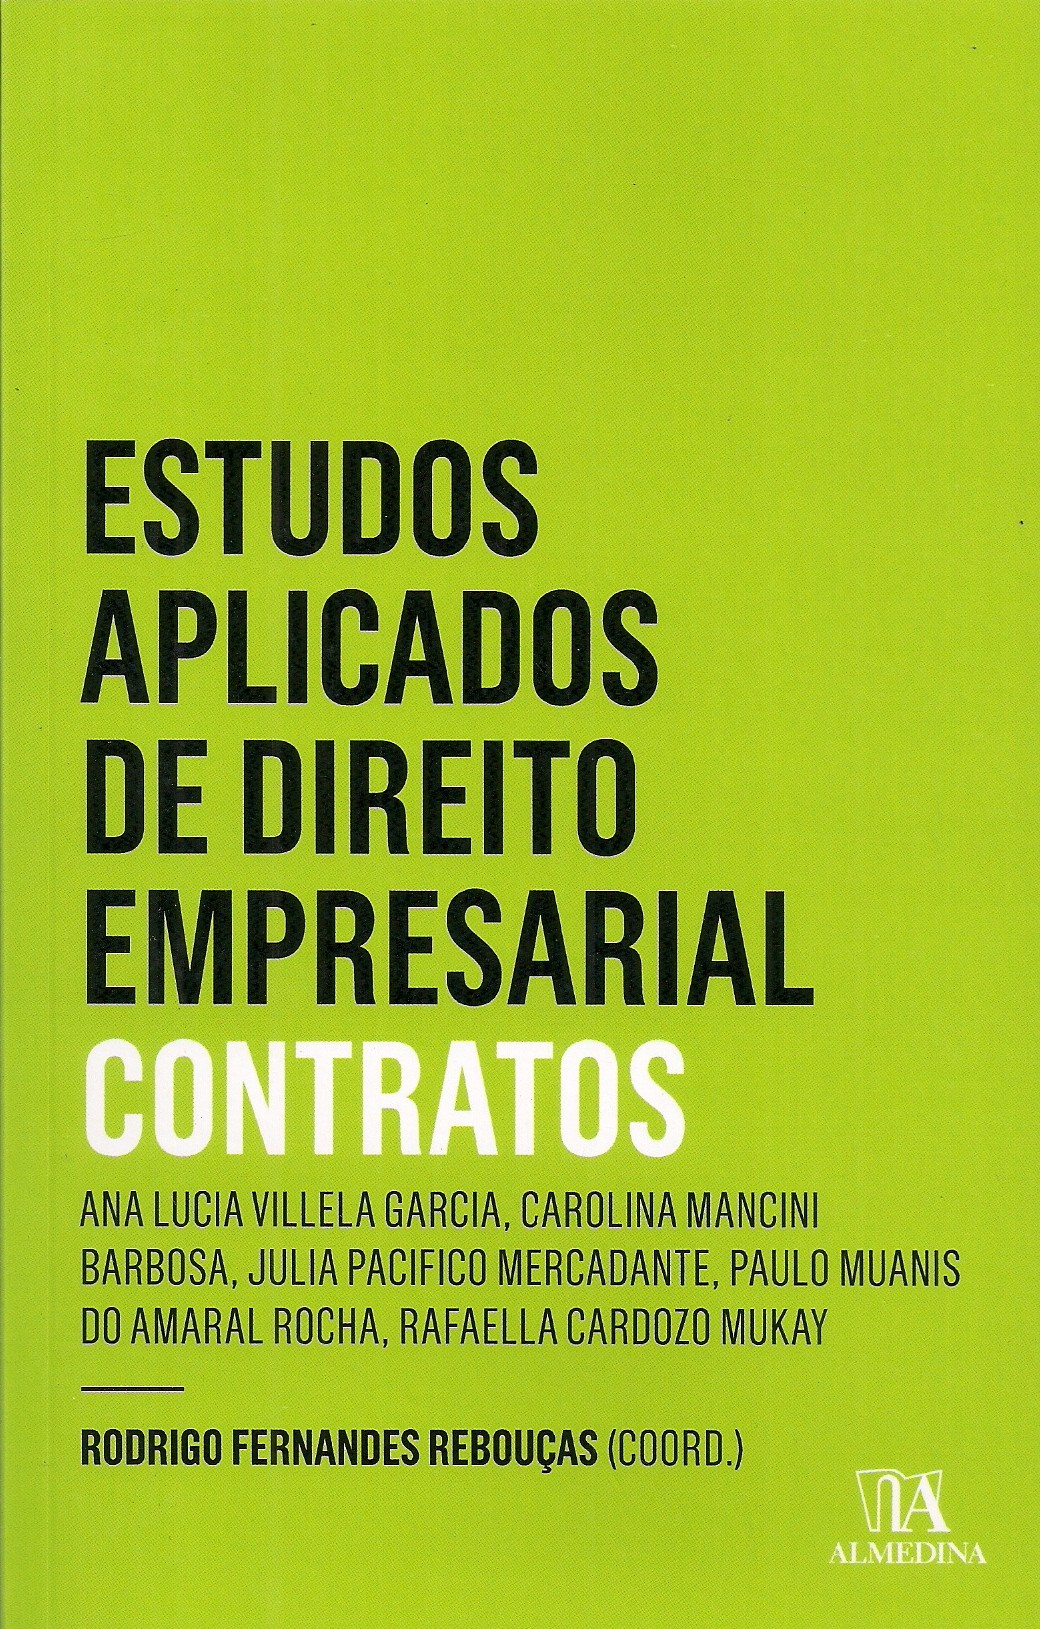 Foto 1 - Estudos aplicados de Direito Empresarial - Contratos - Ano 1 - N°4